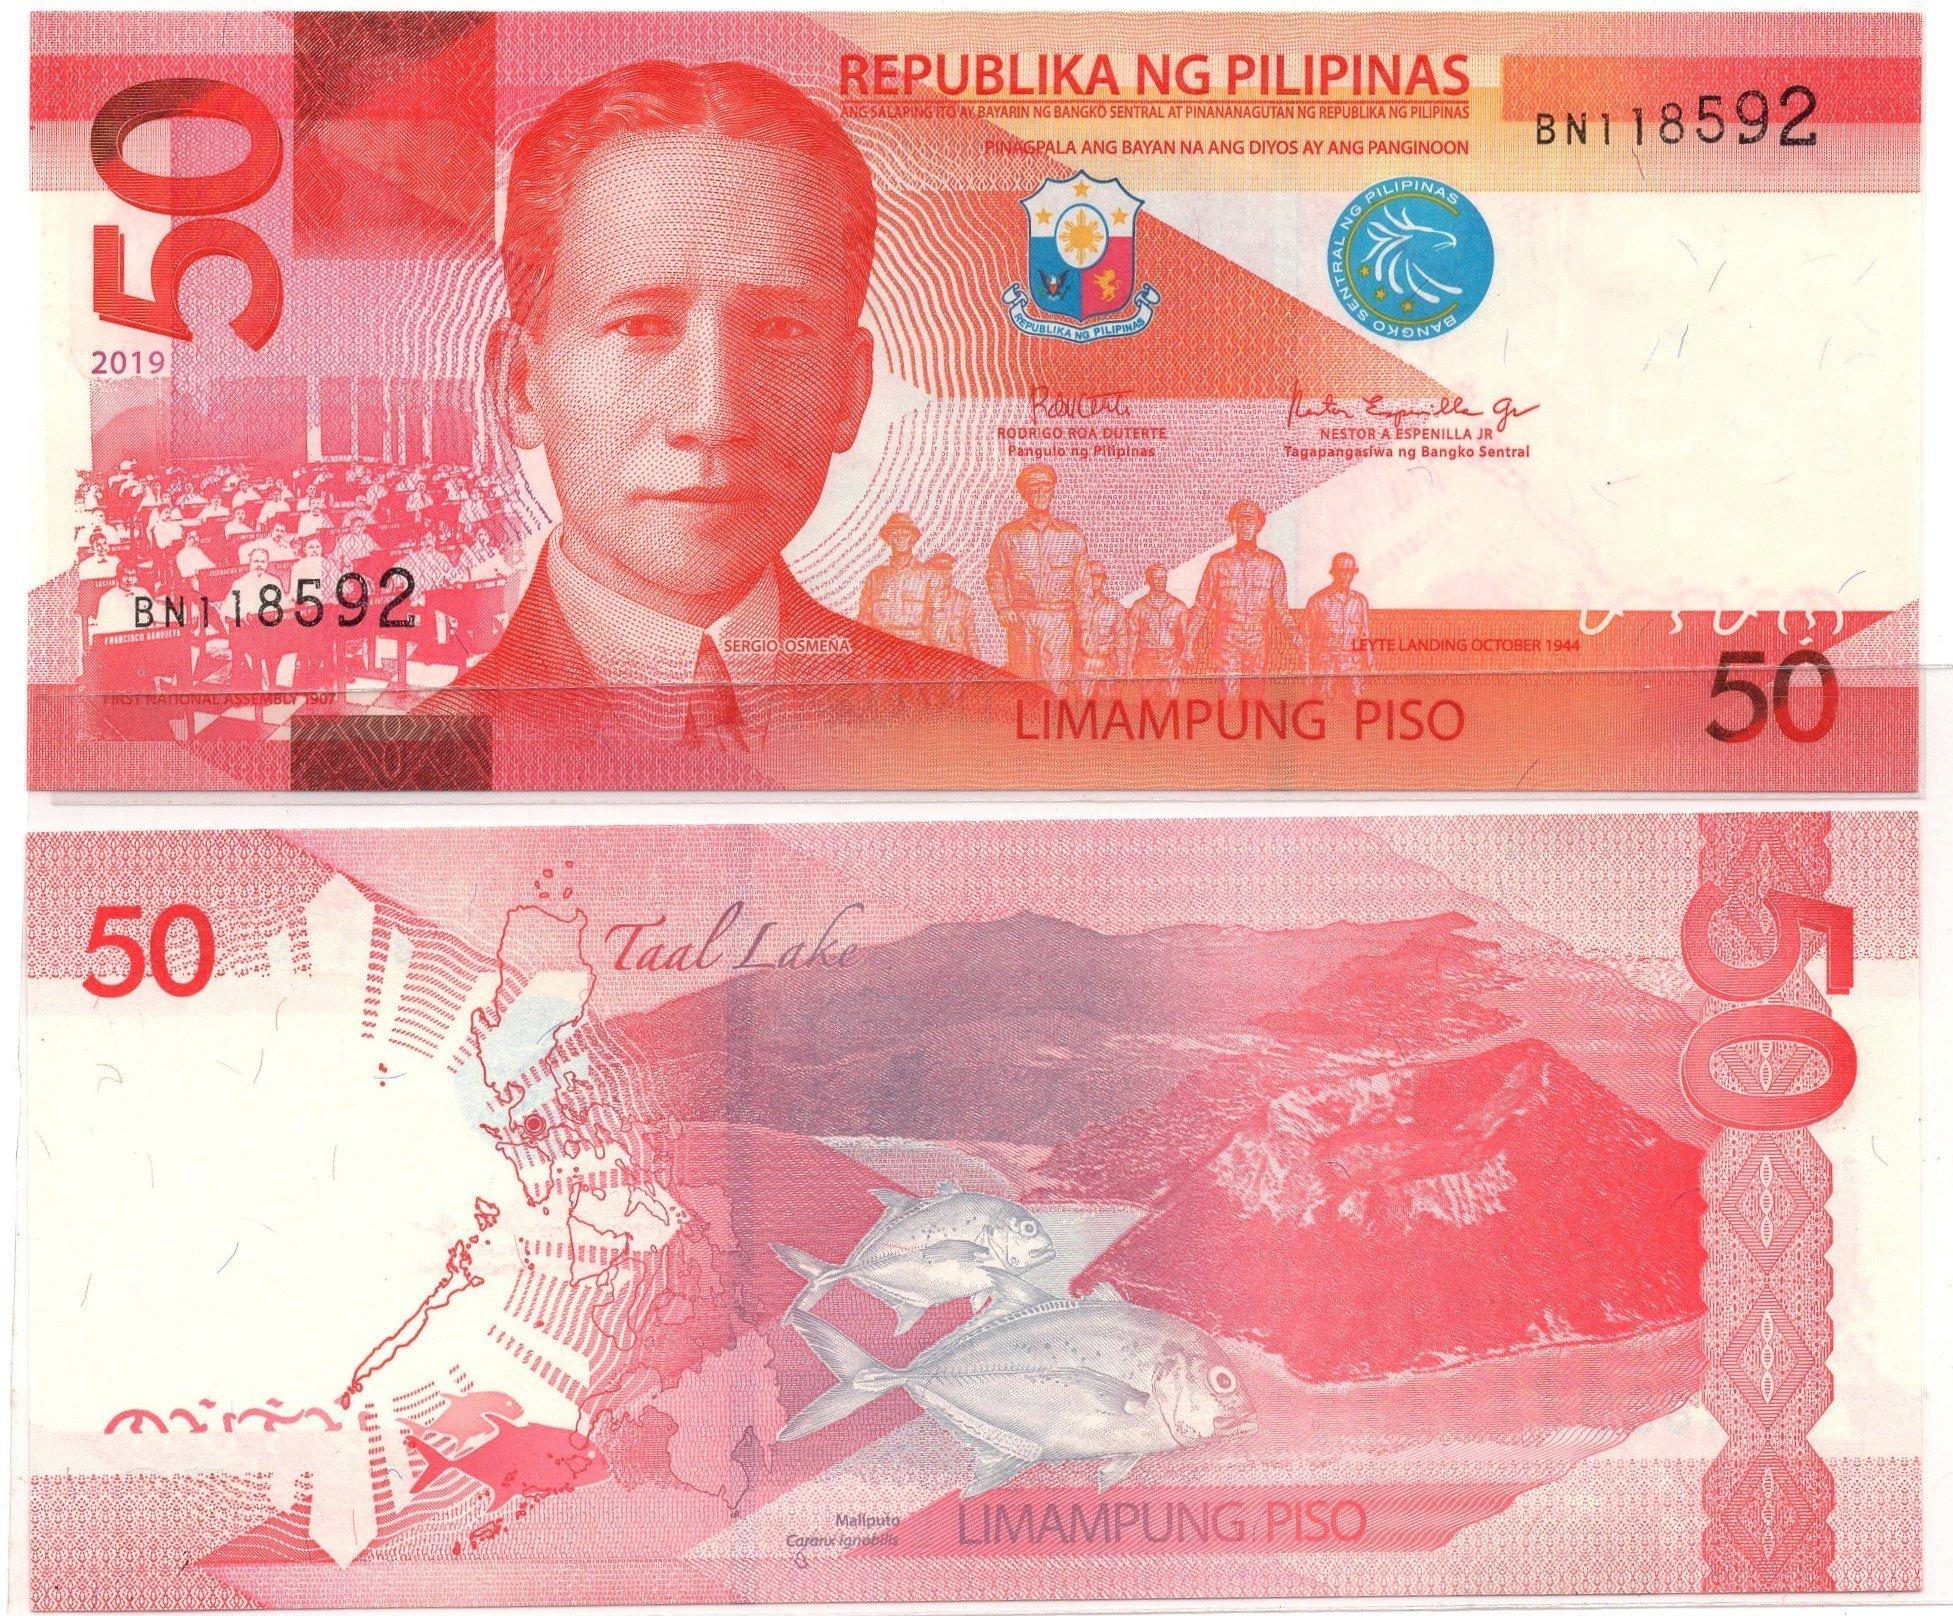 philipines 50 pesos 2019